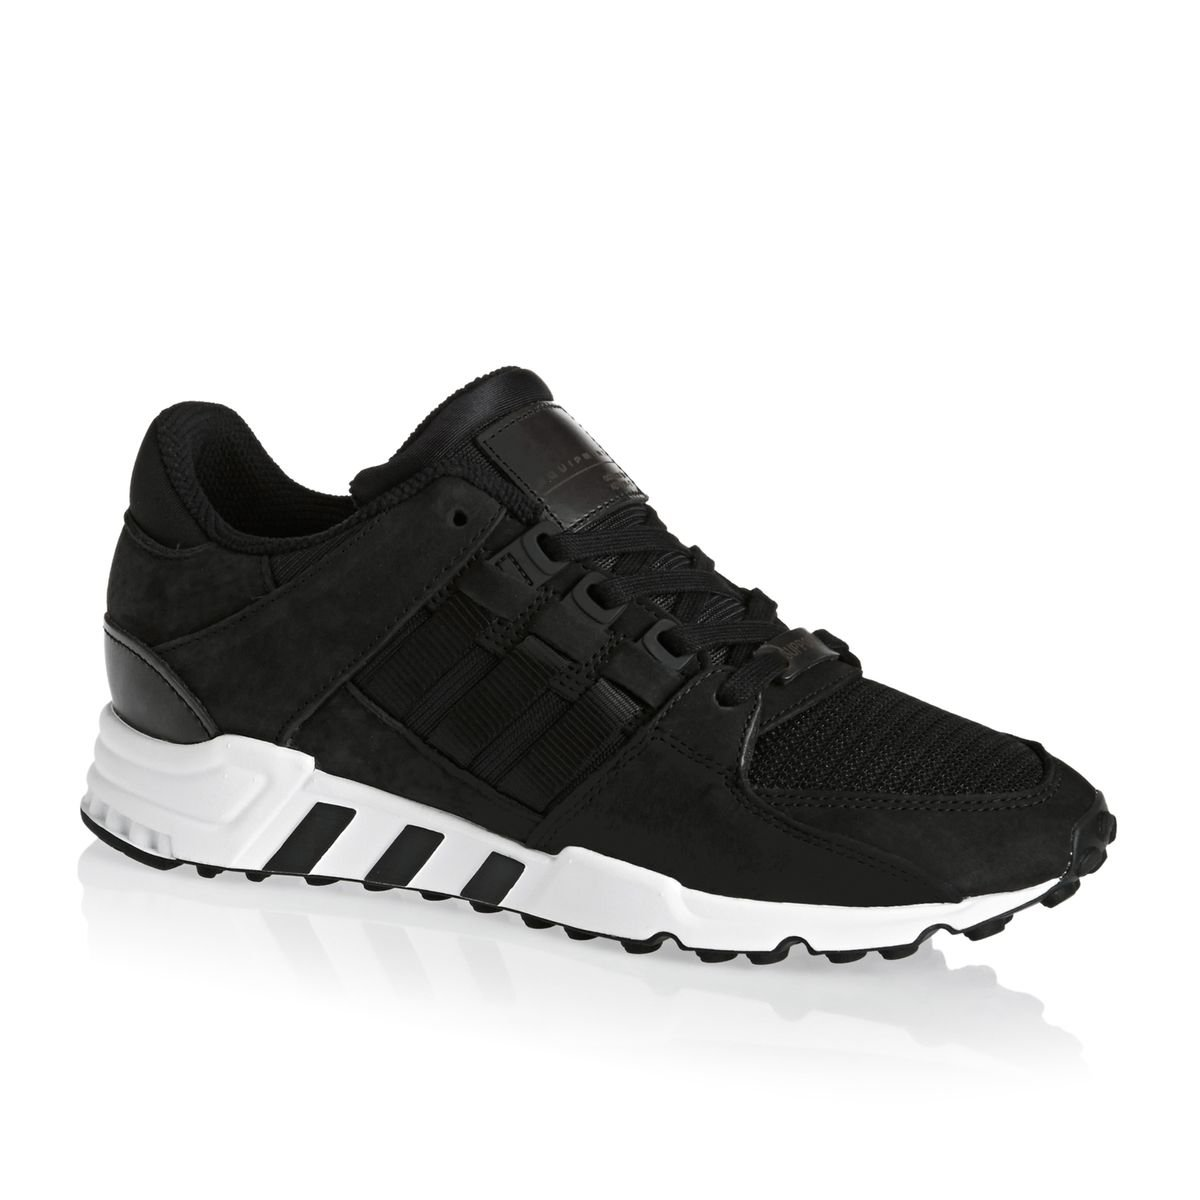 huge discount e15d0 7f775 adidas Mens Originals EQT Support Rf Trainers in Black Amazon.co.uk Shoes   Bags